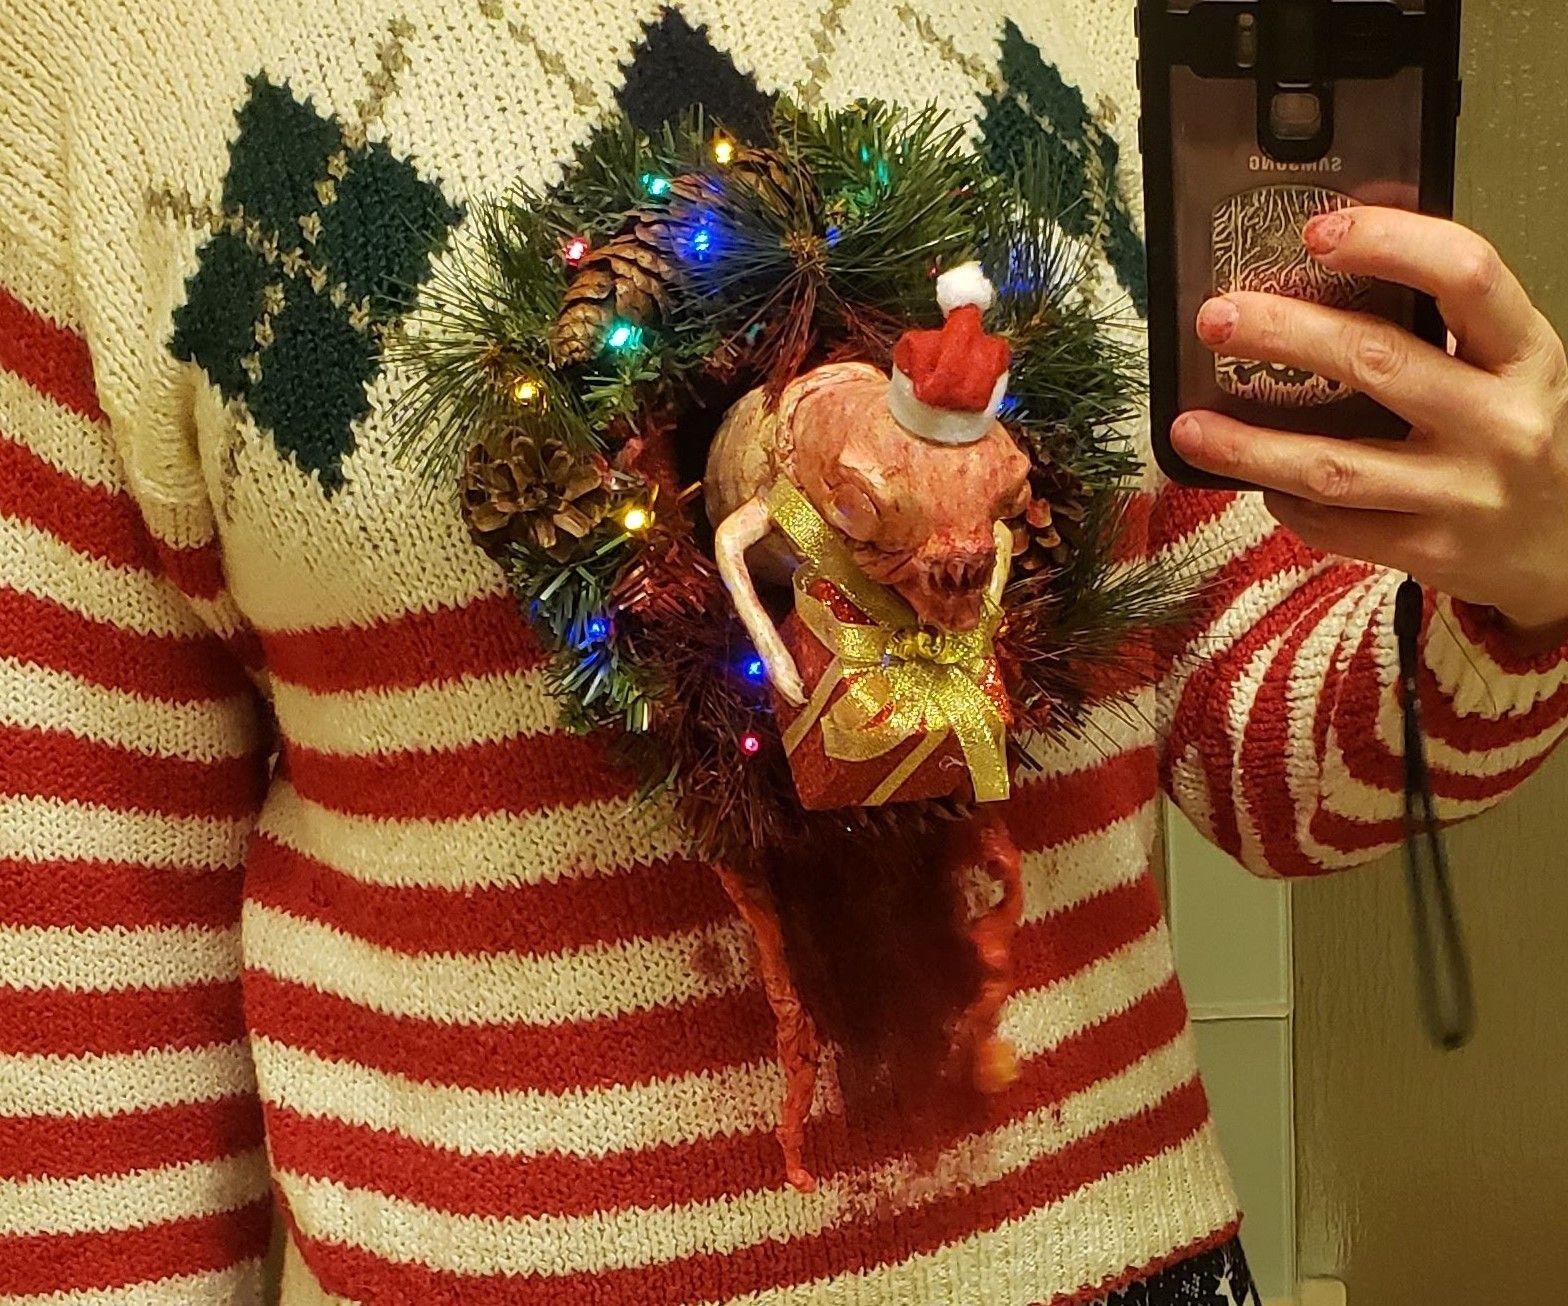 Festive Chestburster Ugly Christmas Sweater - ANIMATED!